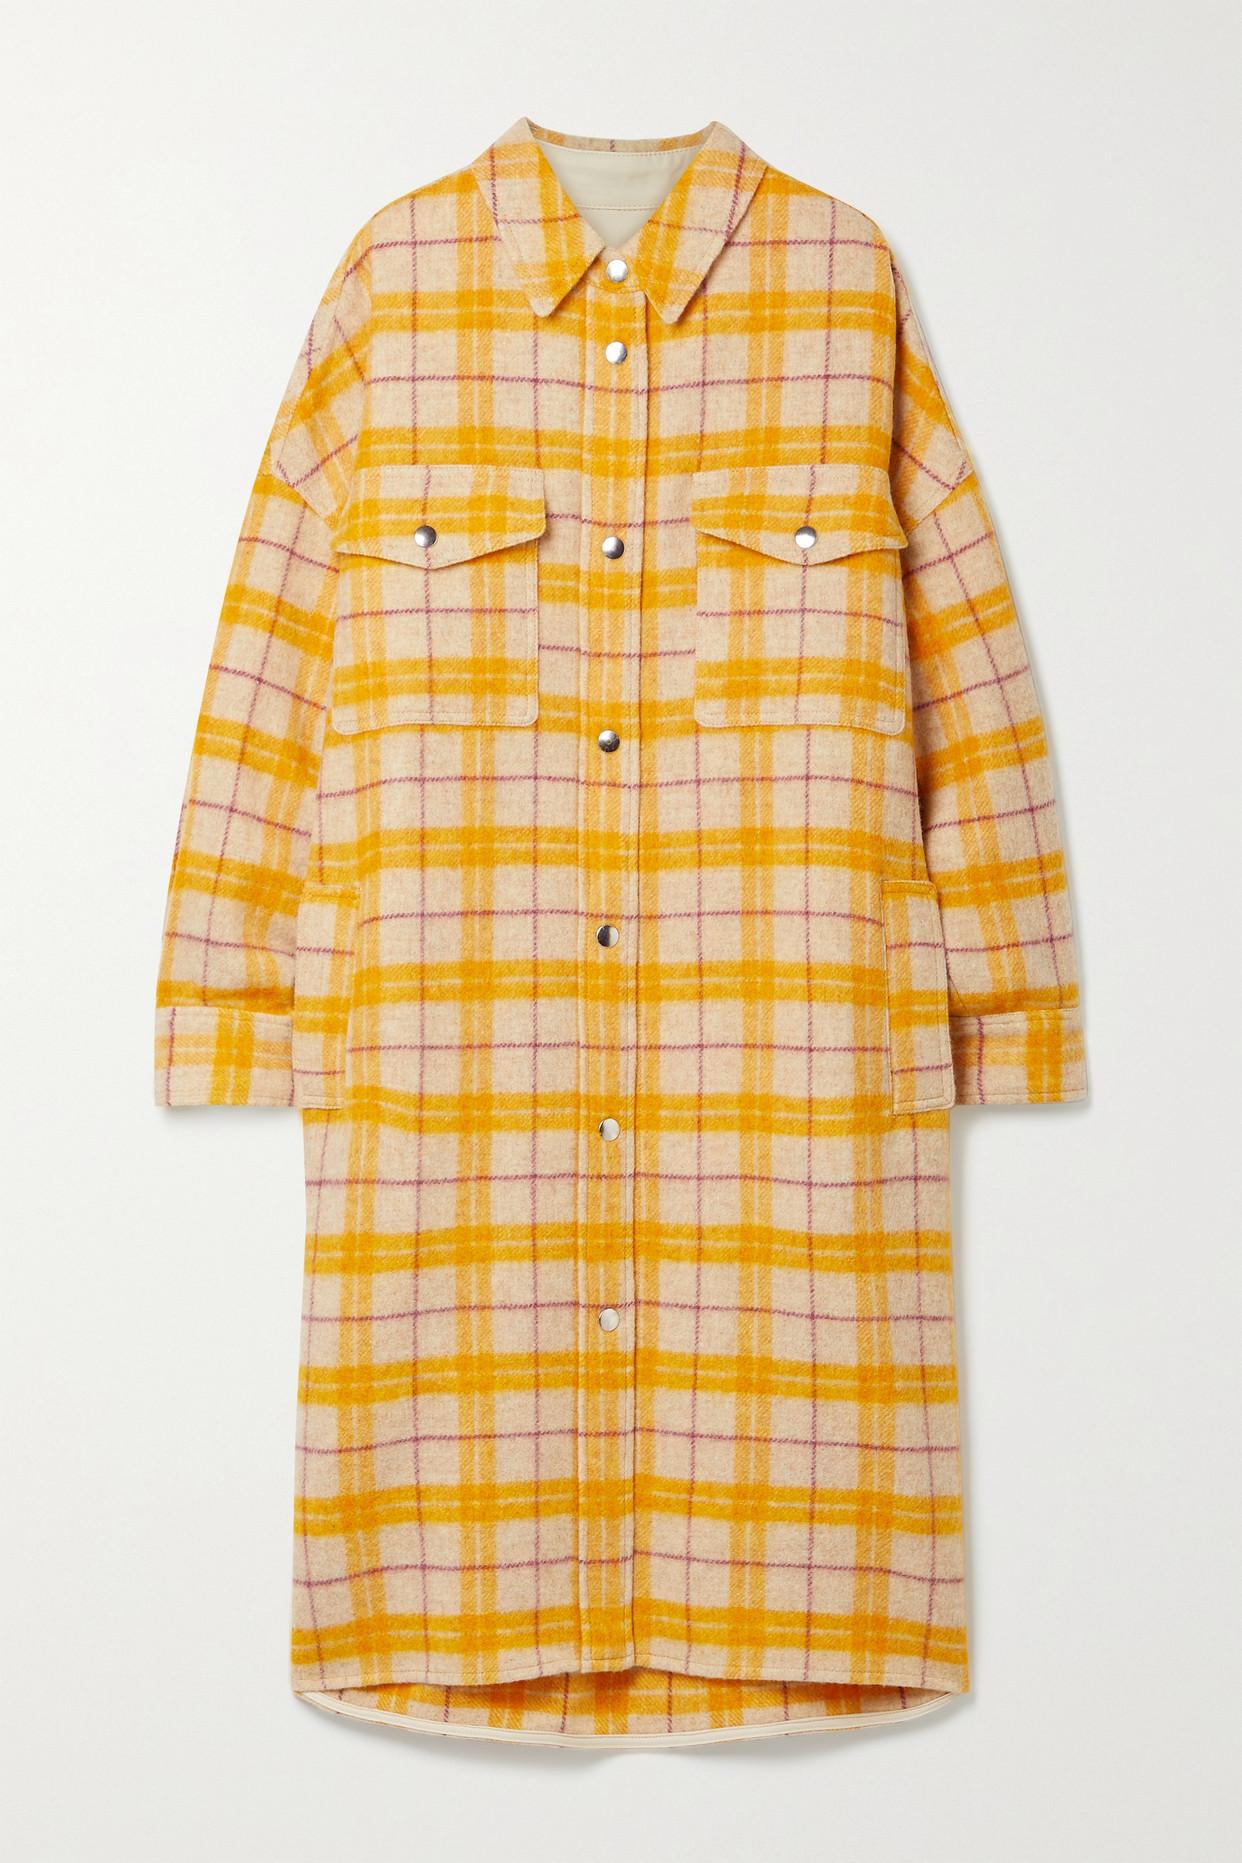 ISABEL MARANT ÉTOILE - Fontia 大廓形格纹羊毛混纺法兰绒外套 - 米色 - FR38